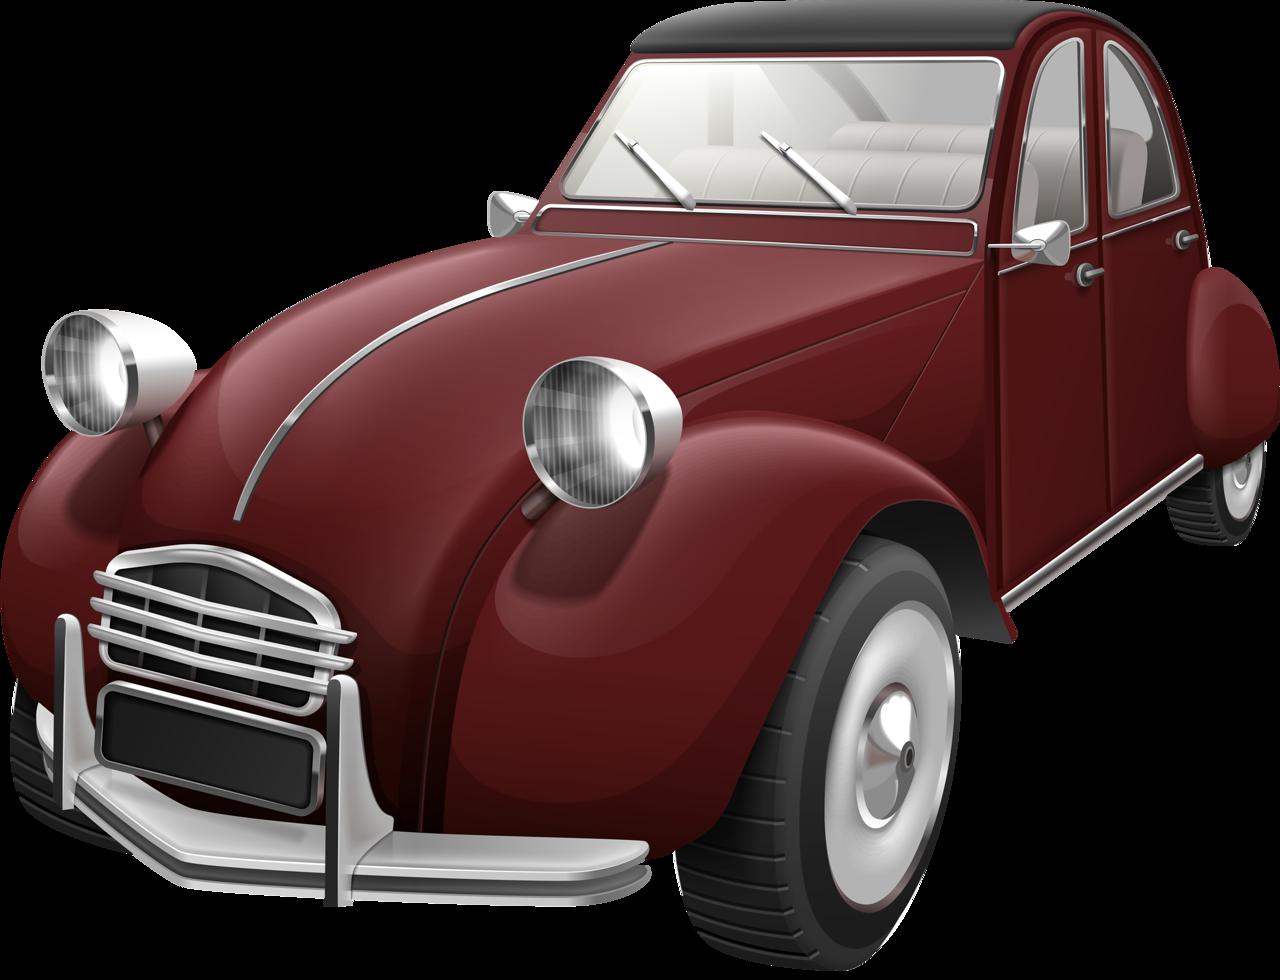 Bz vector png pinterest. Clipart cars watercolor